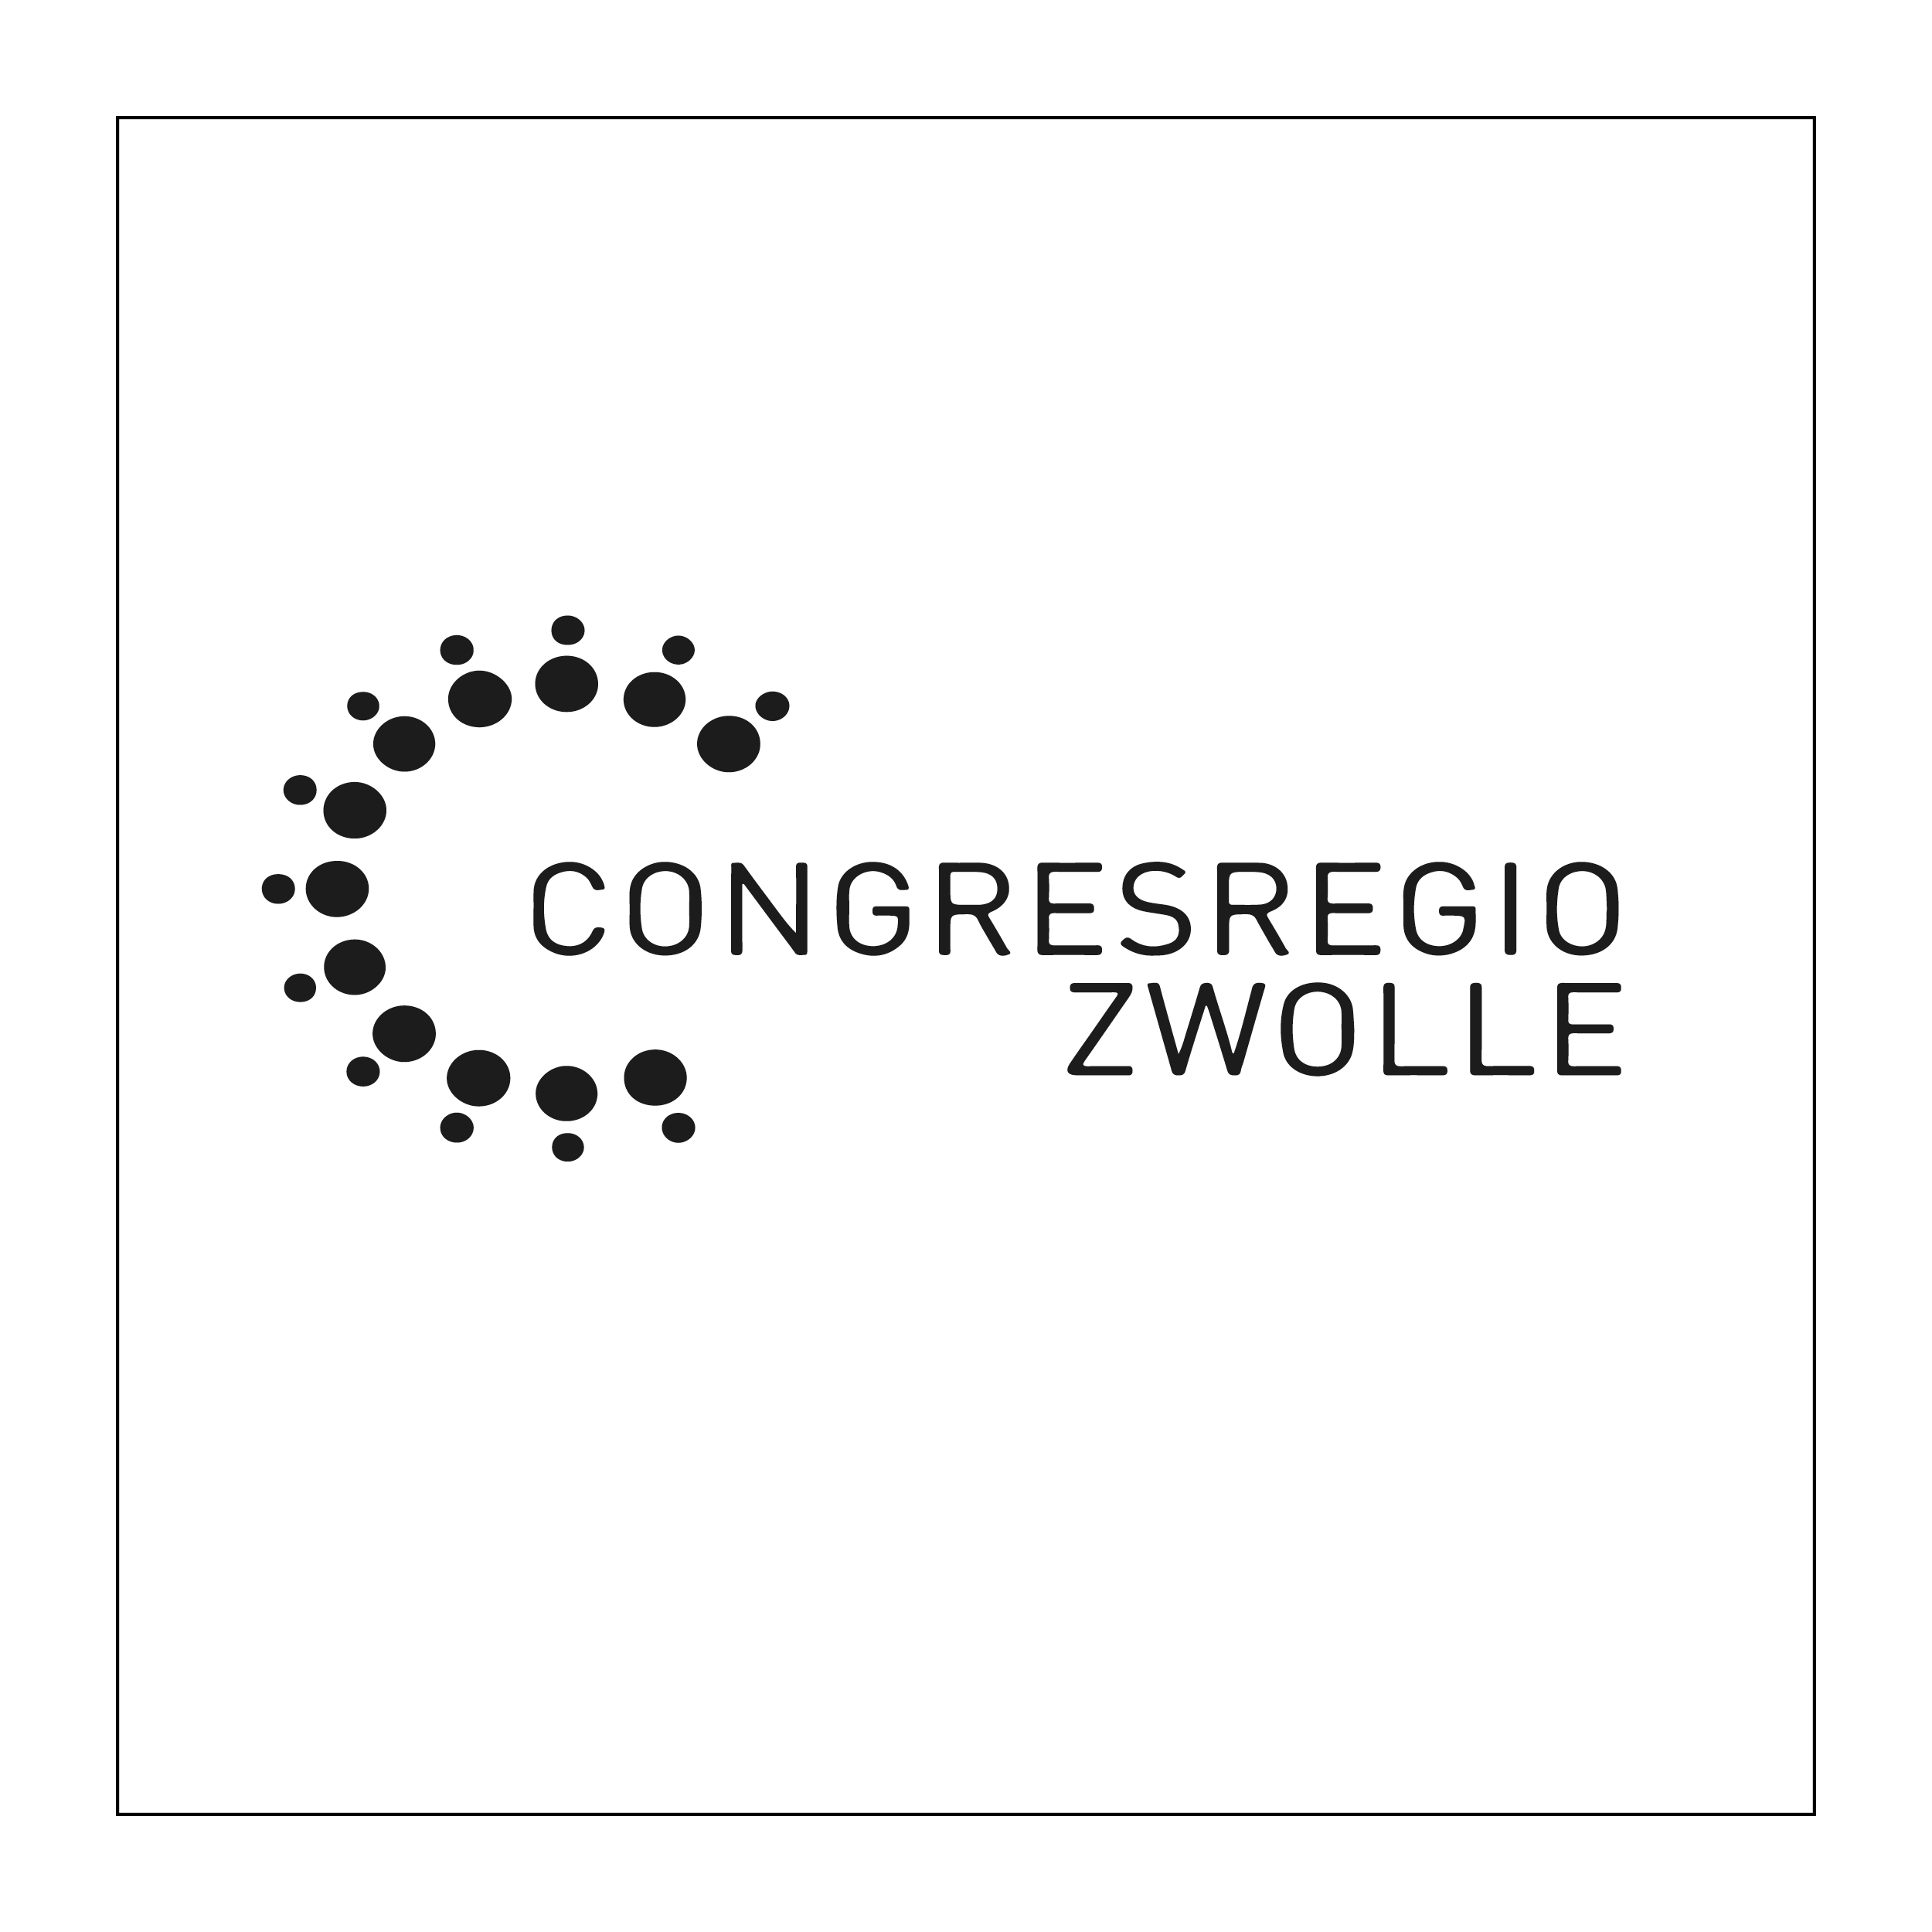 congresregio zwolle